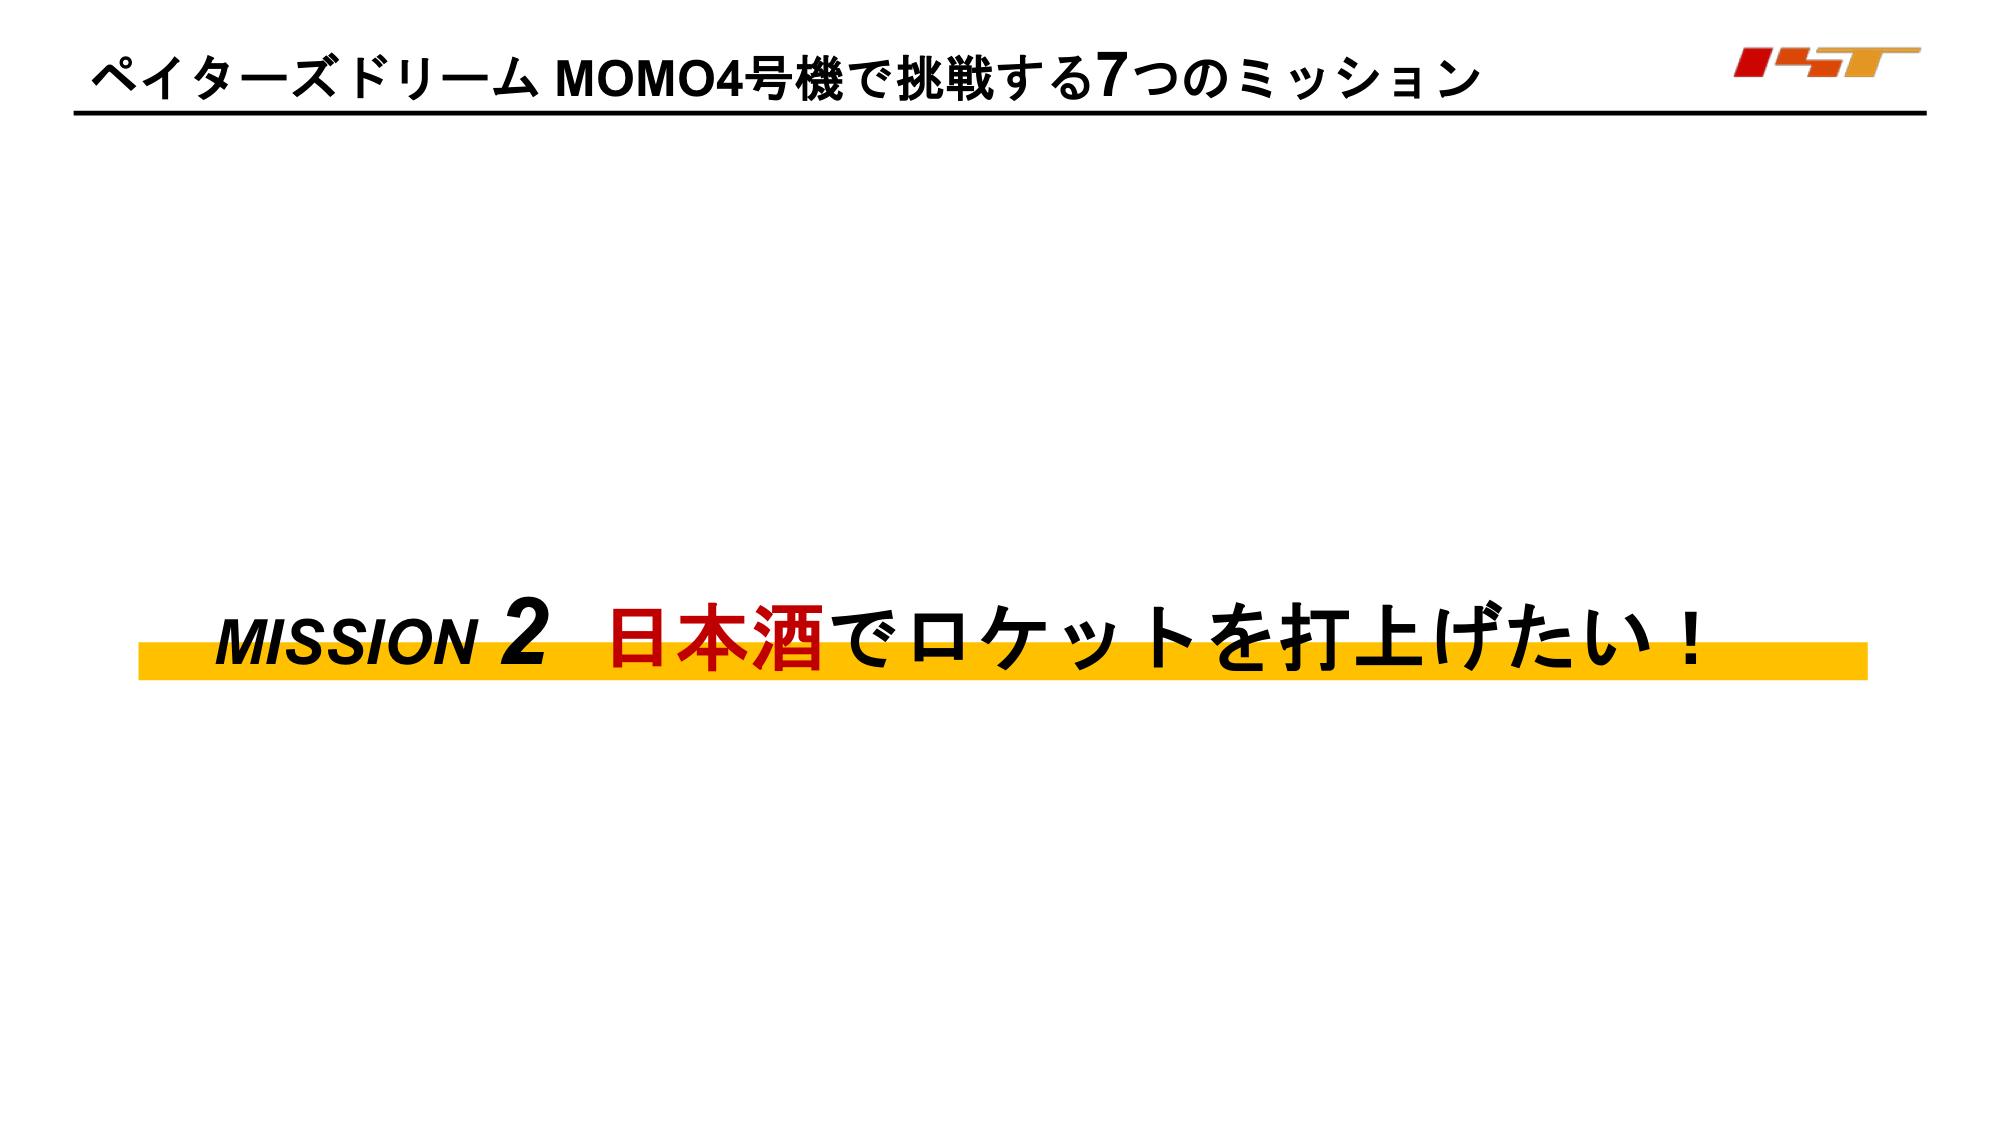 f:id:Imamura:20190628161229p:plain